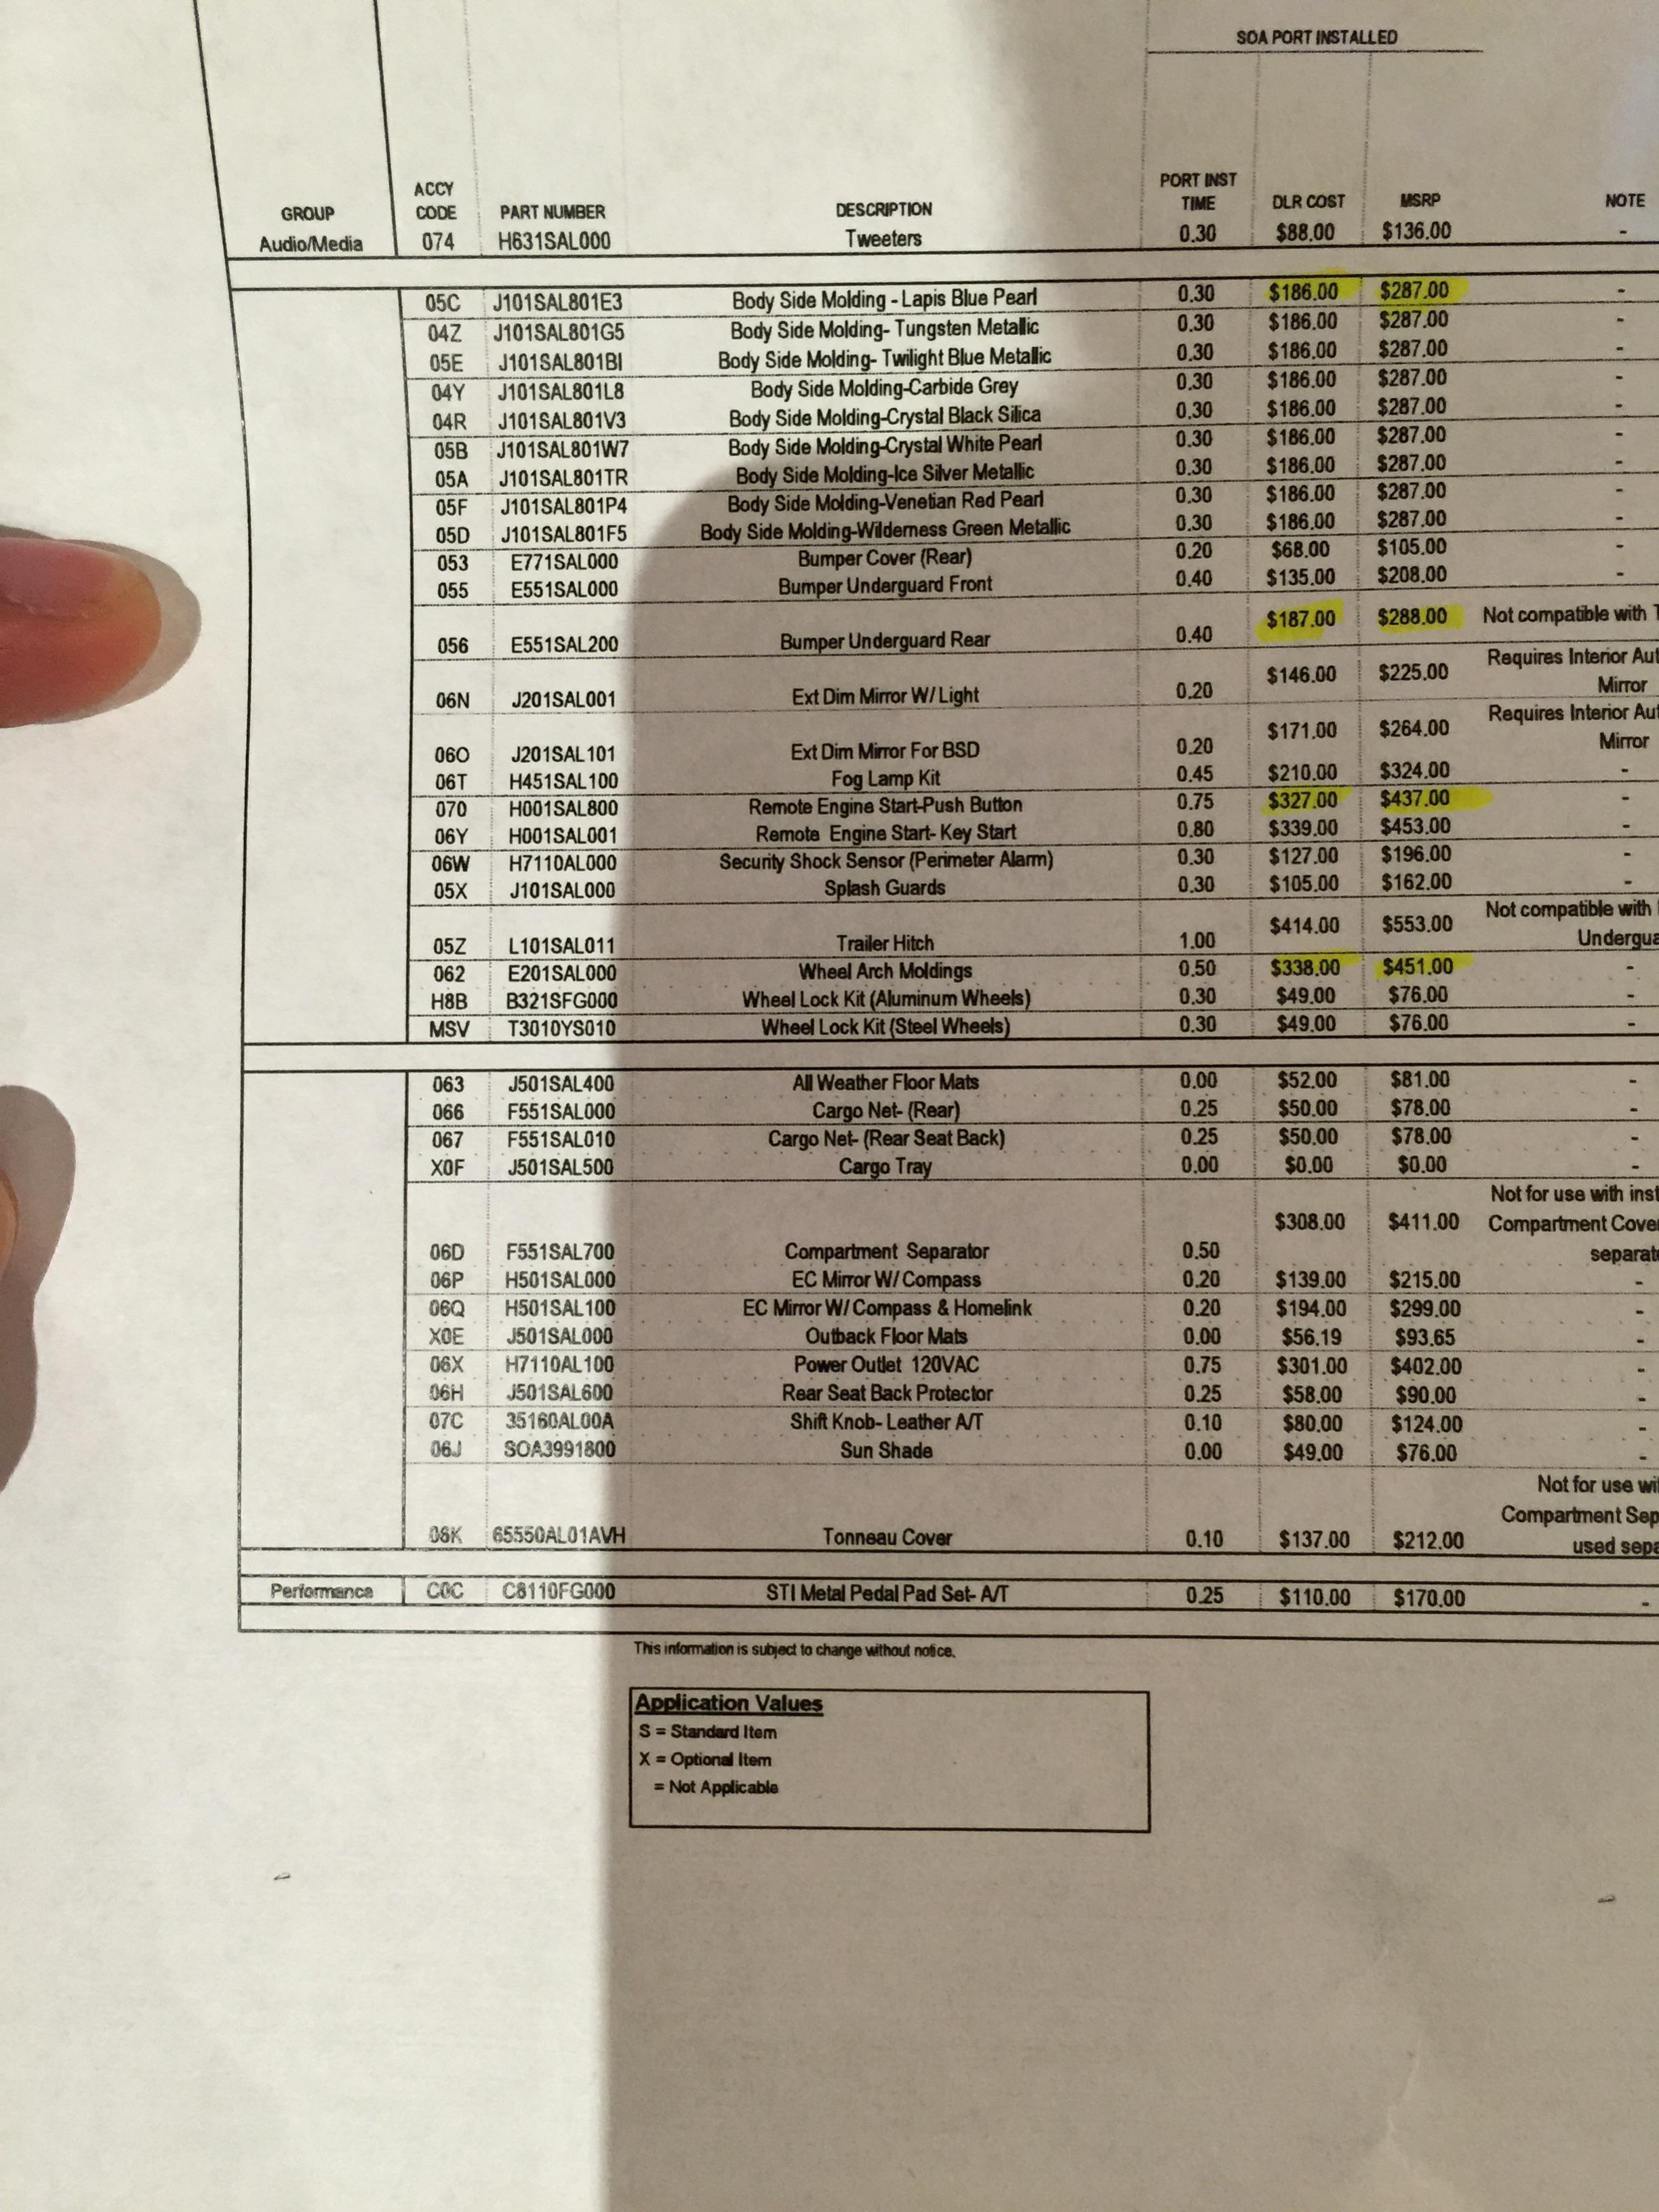 Subaru Forester Invoice Price 2015